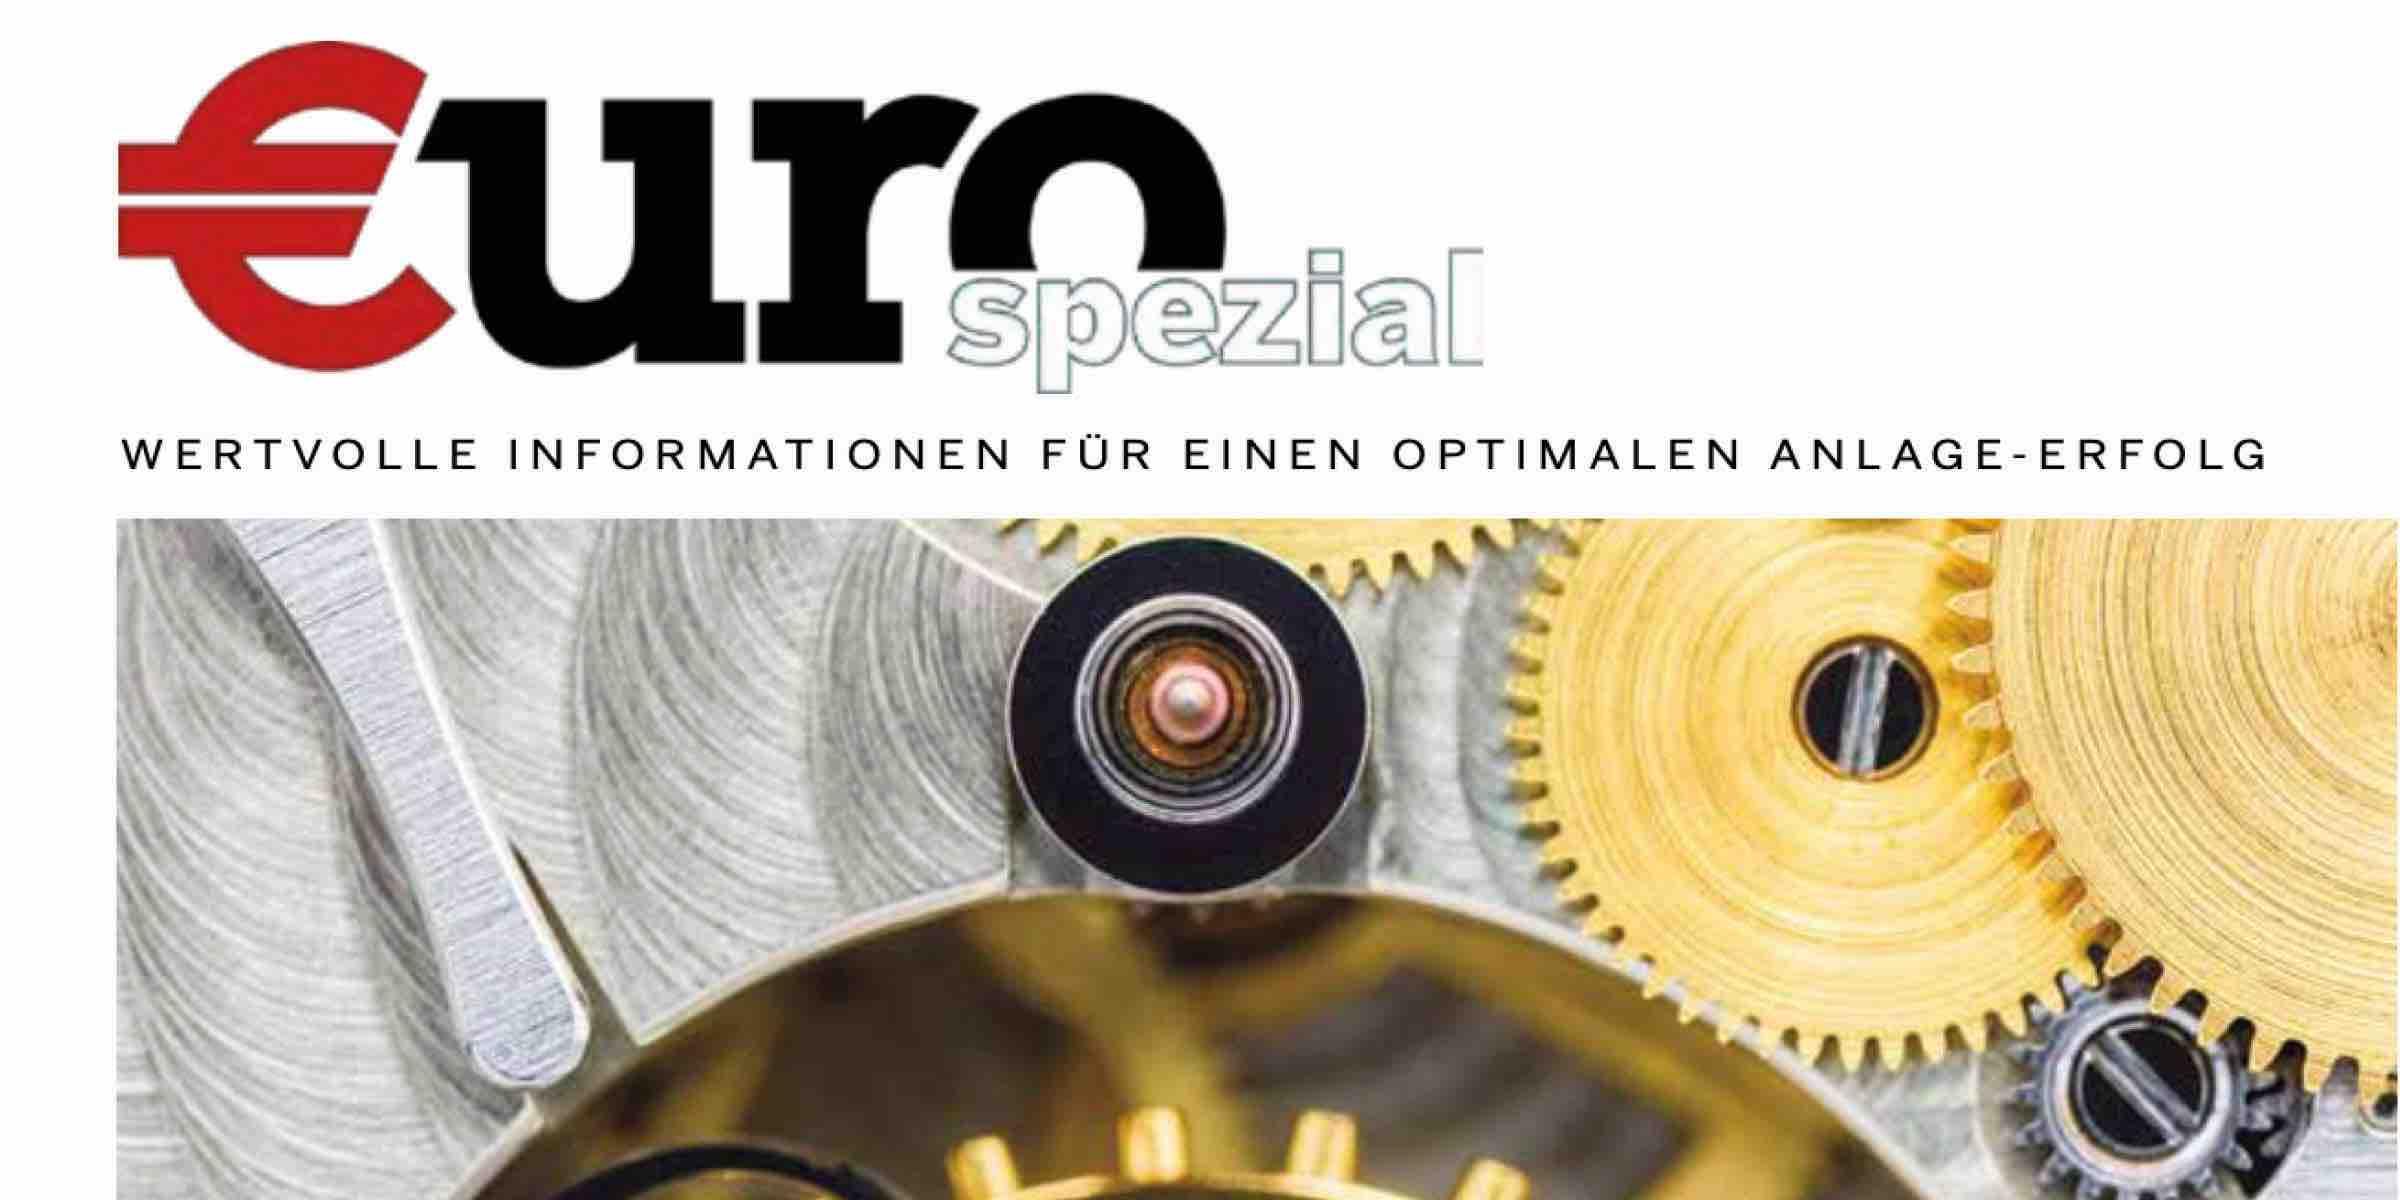 Euro Spezial